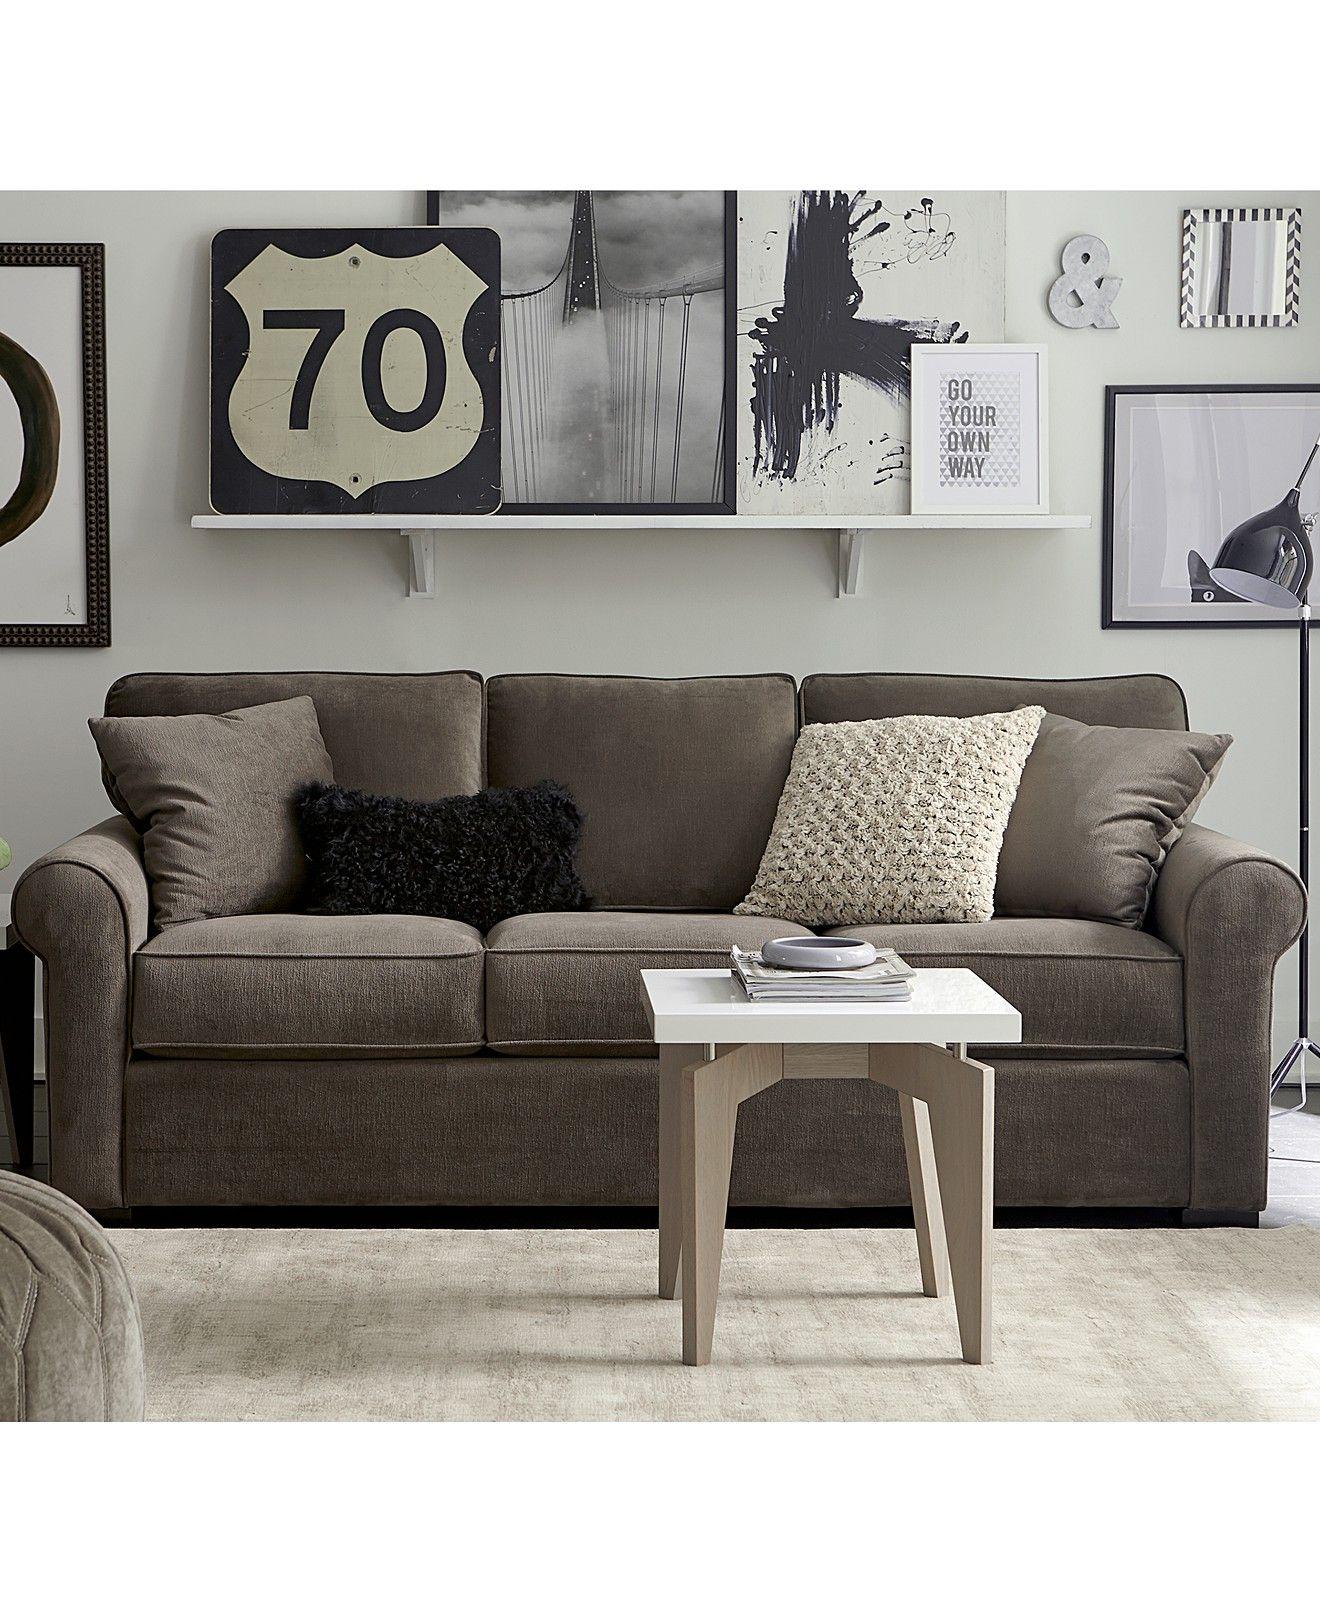 Remo Ii Fabric Sofa Custom Colors Couches Sofas Furniture Macy S